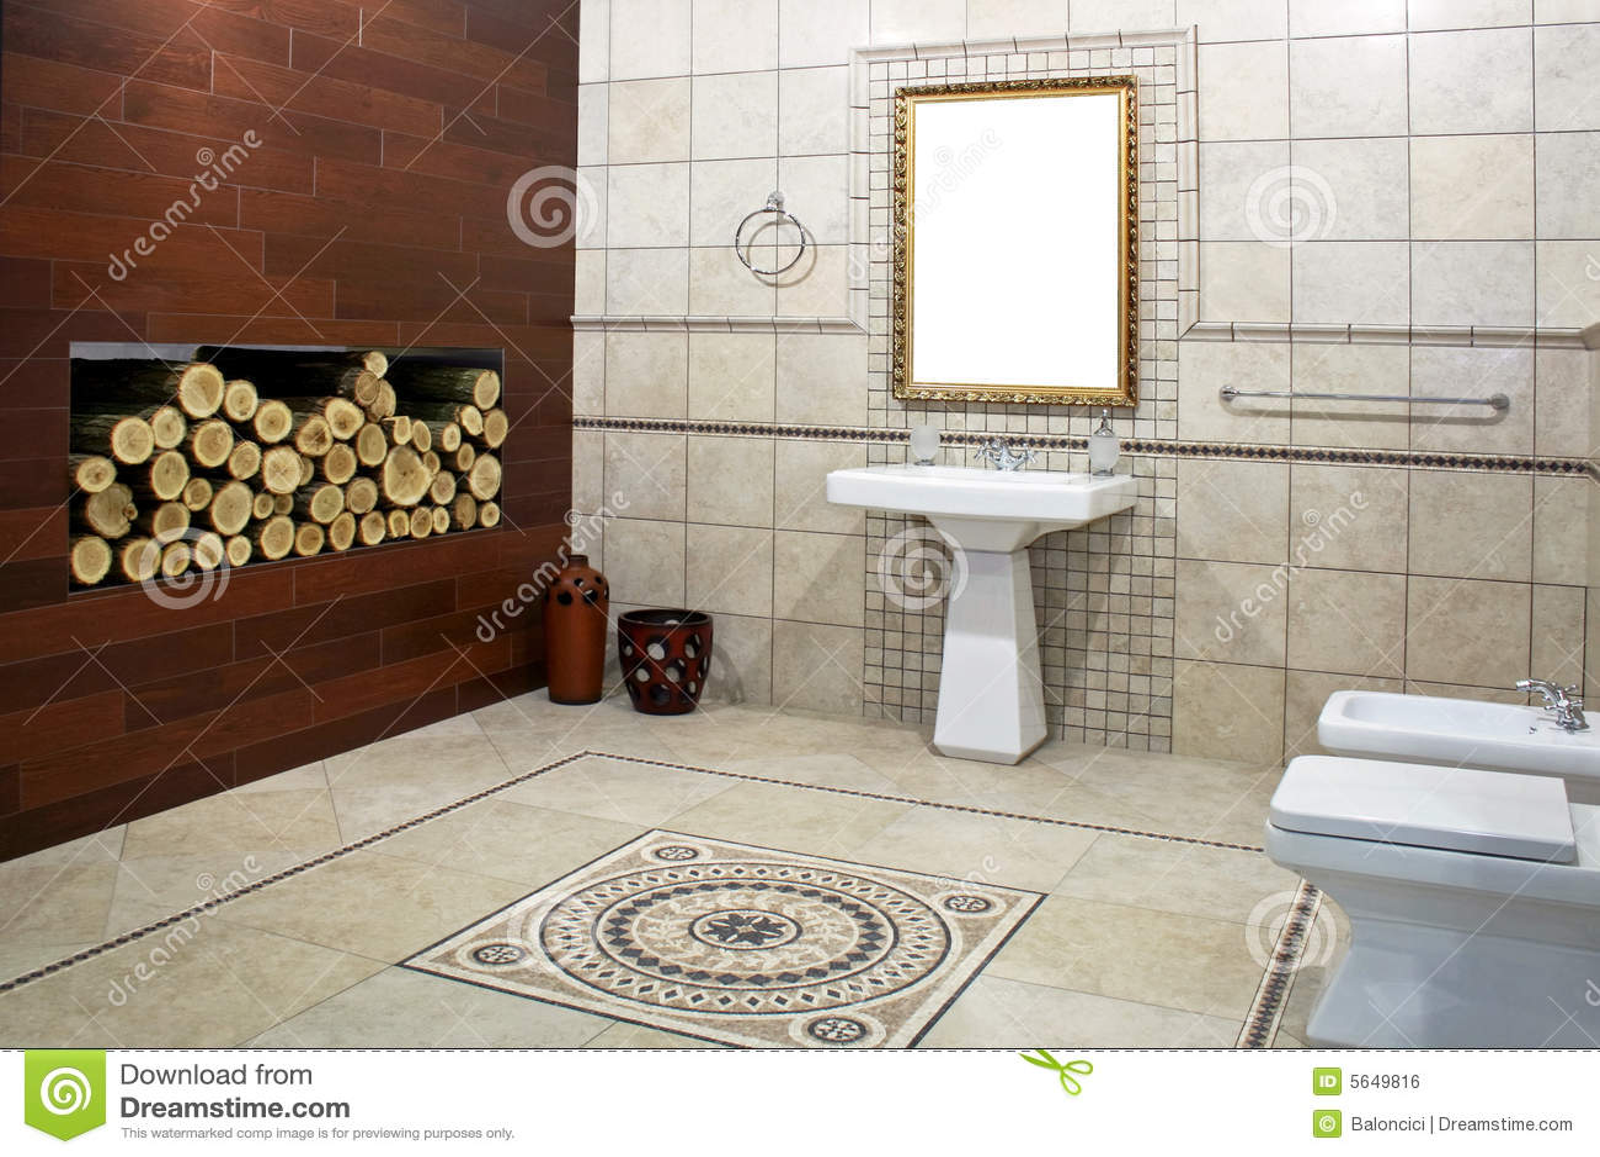 Italiaanse badkamers stock foto. Afbeelding bestaande uit huis - 5649816